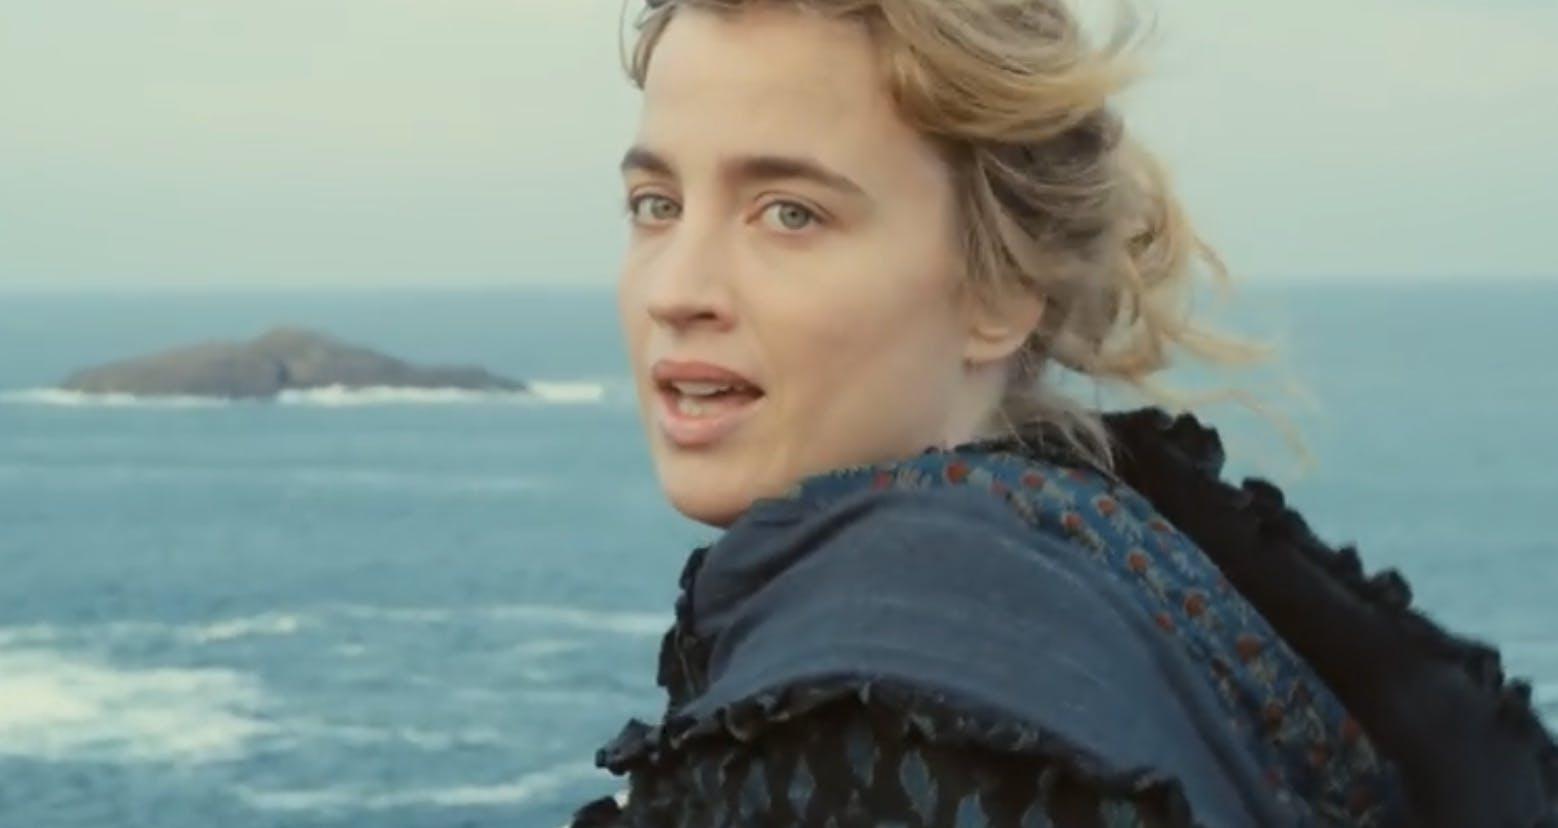 Hulu best movies Portrait of a Lady on Fire